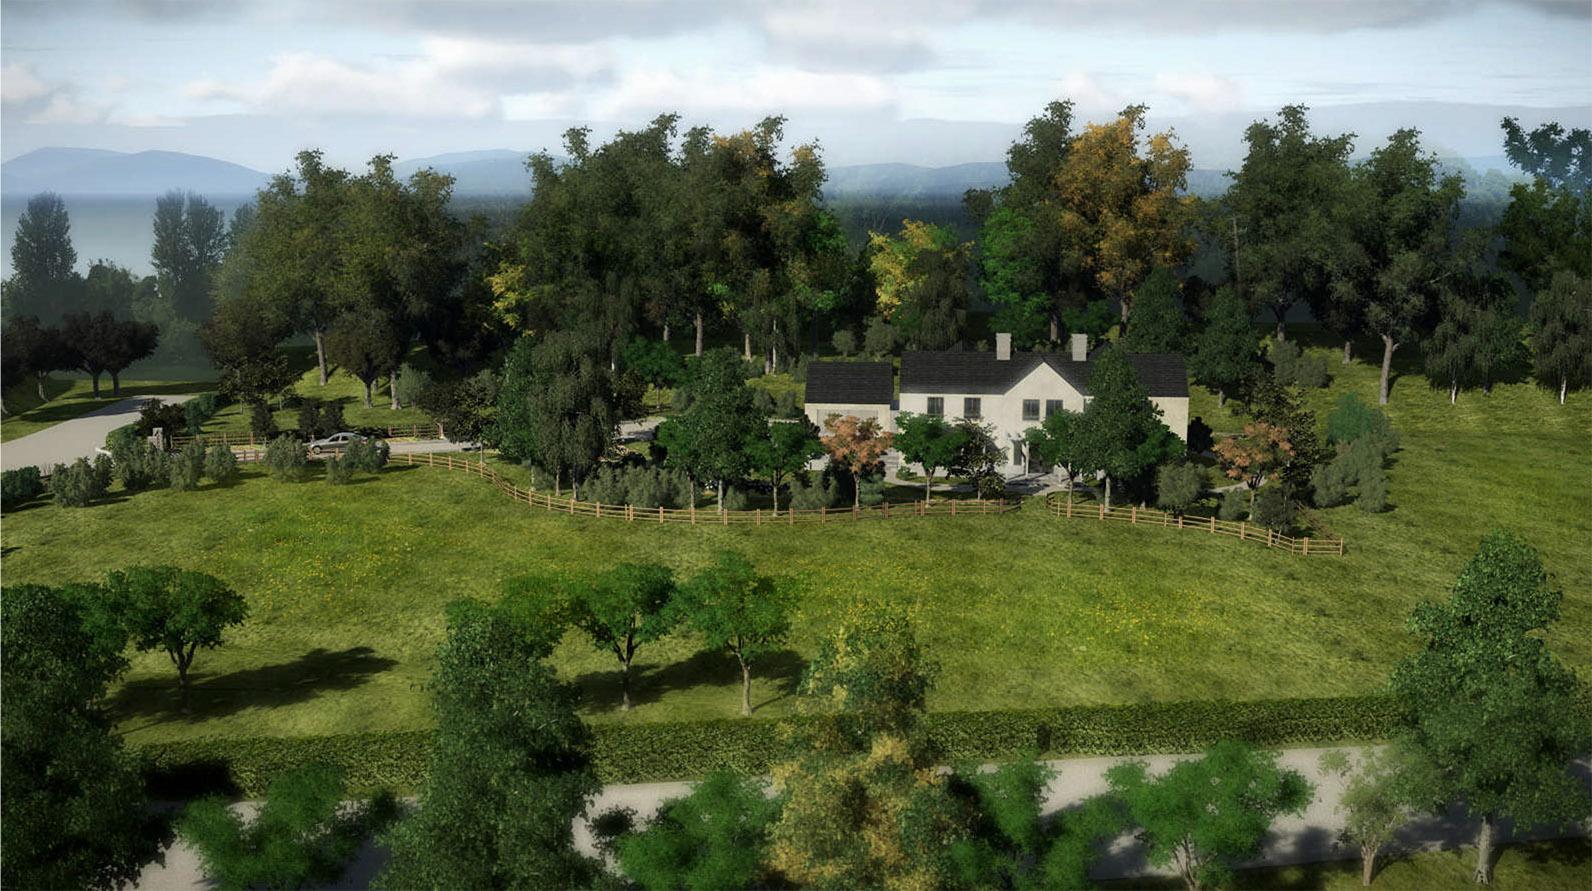 New_House_Design_Architect_Dublin_RIAI_Bespoke_Rural_04.jpg